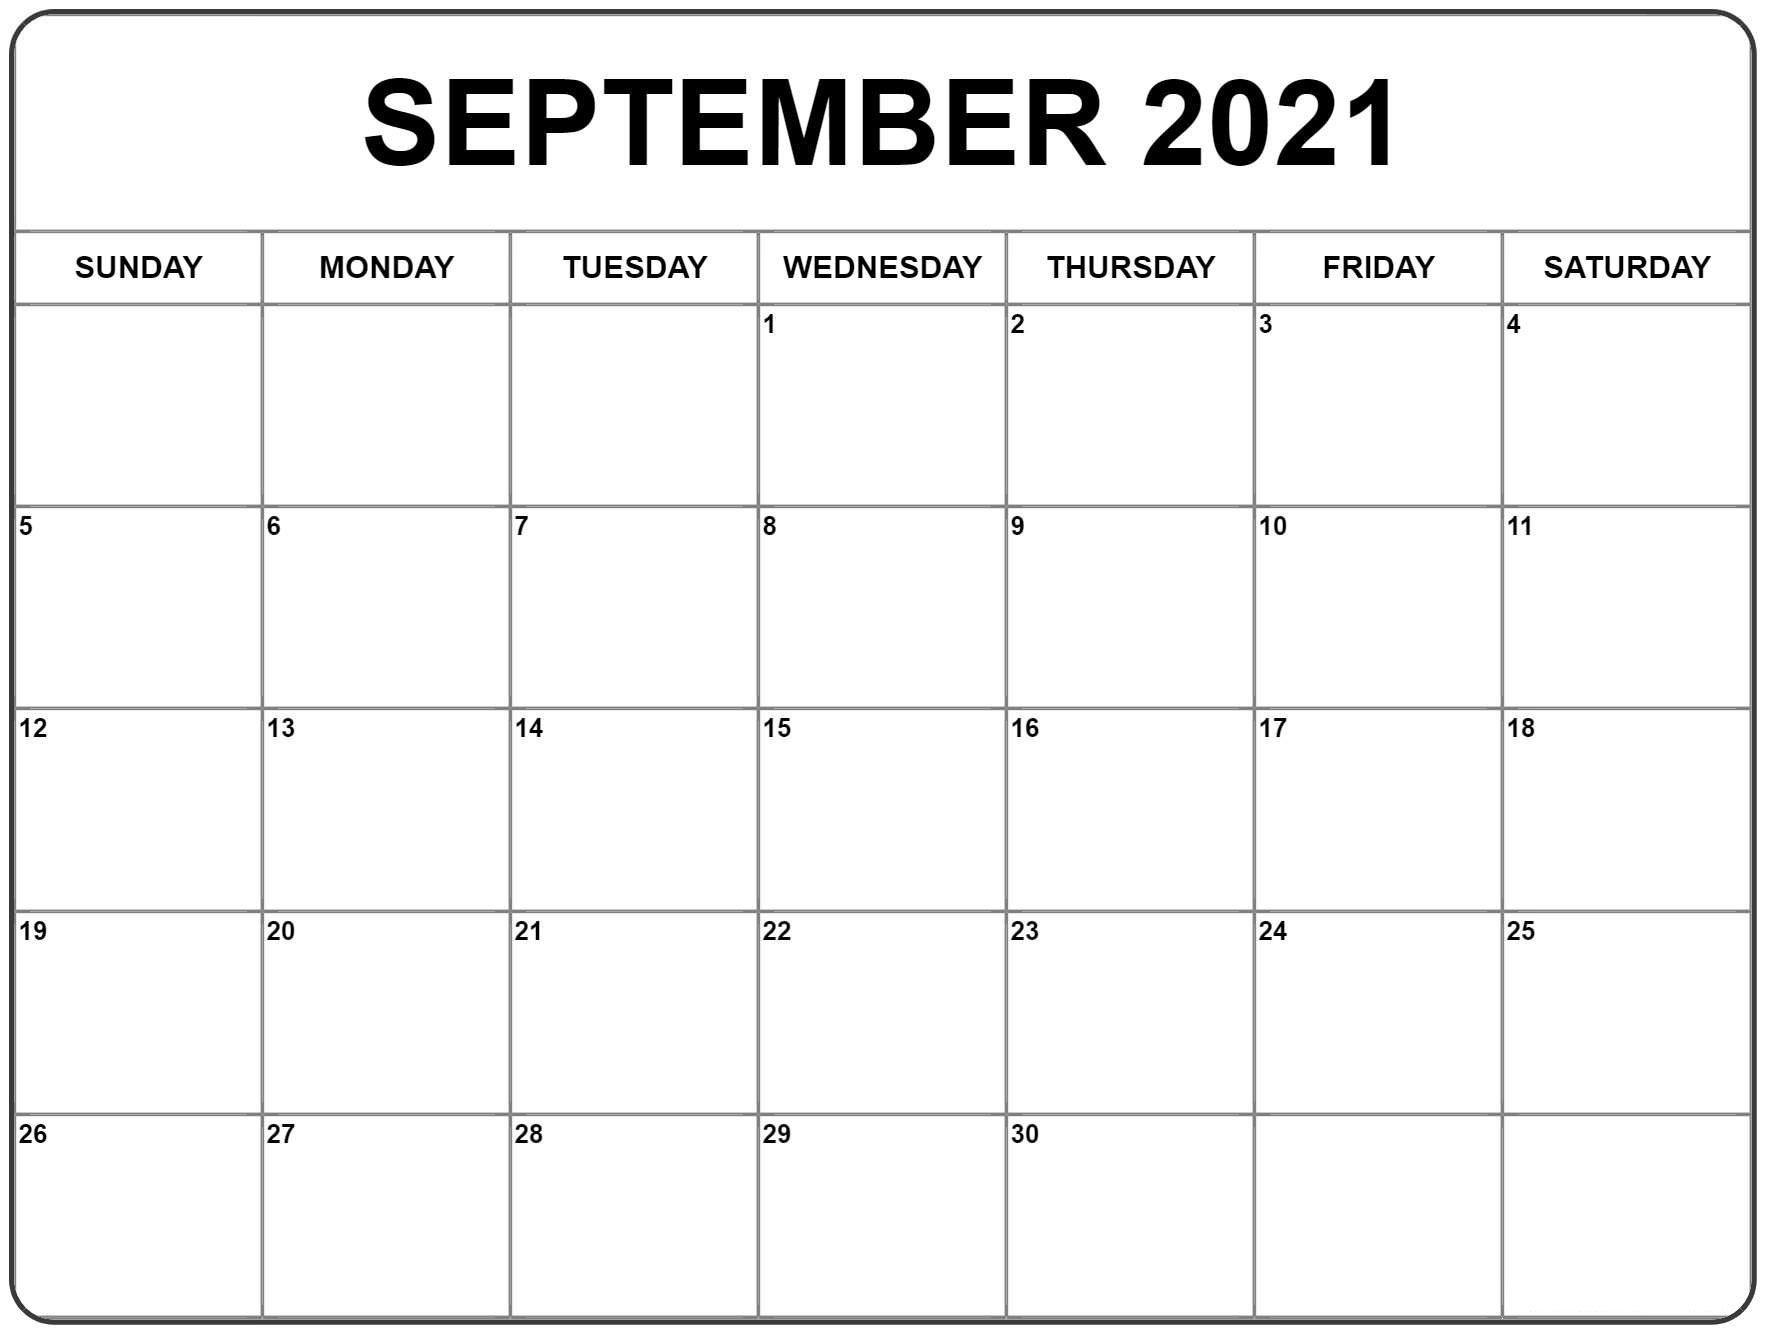 September 2021 Calendar | Blank Monthly Calendar Template-2021 Monthly Calendar Template Word